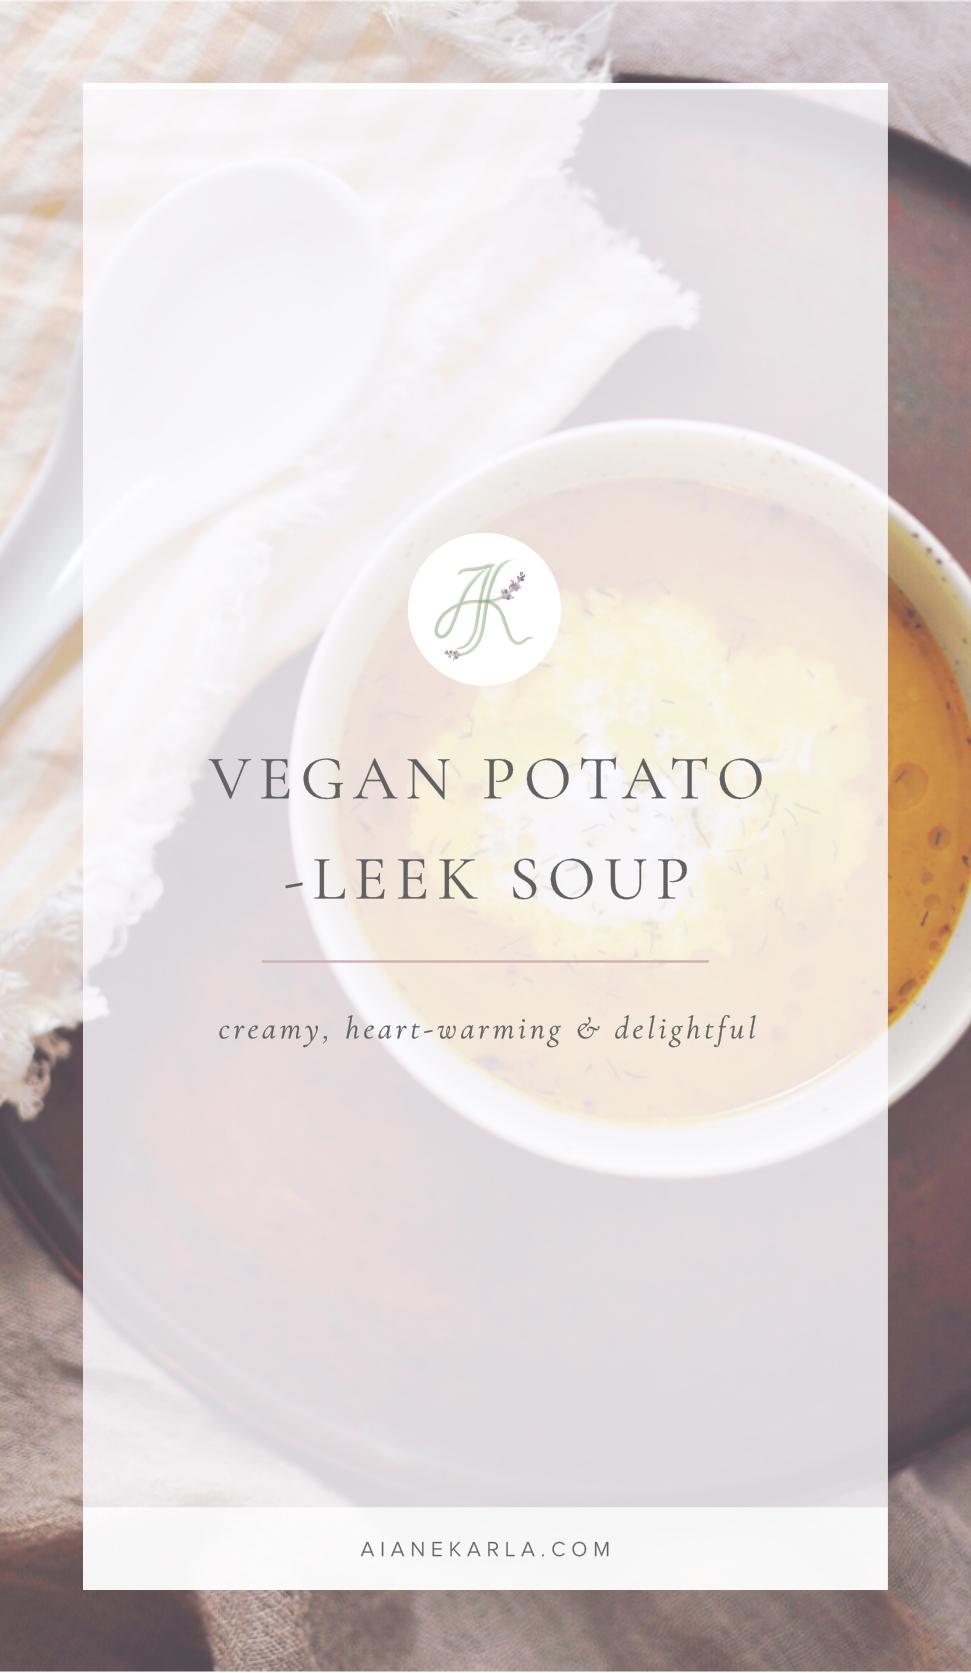 Vegan Potato Leek Soup   Aiane Karla   www.AianeKarla.com